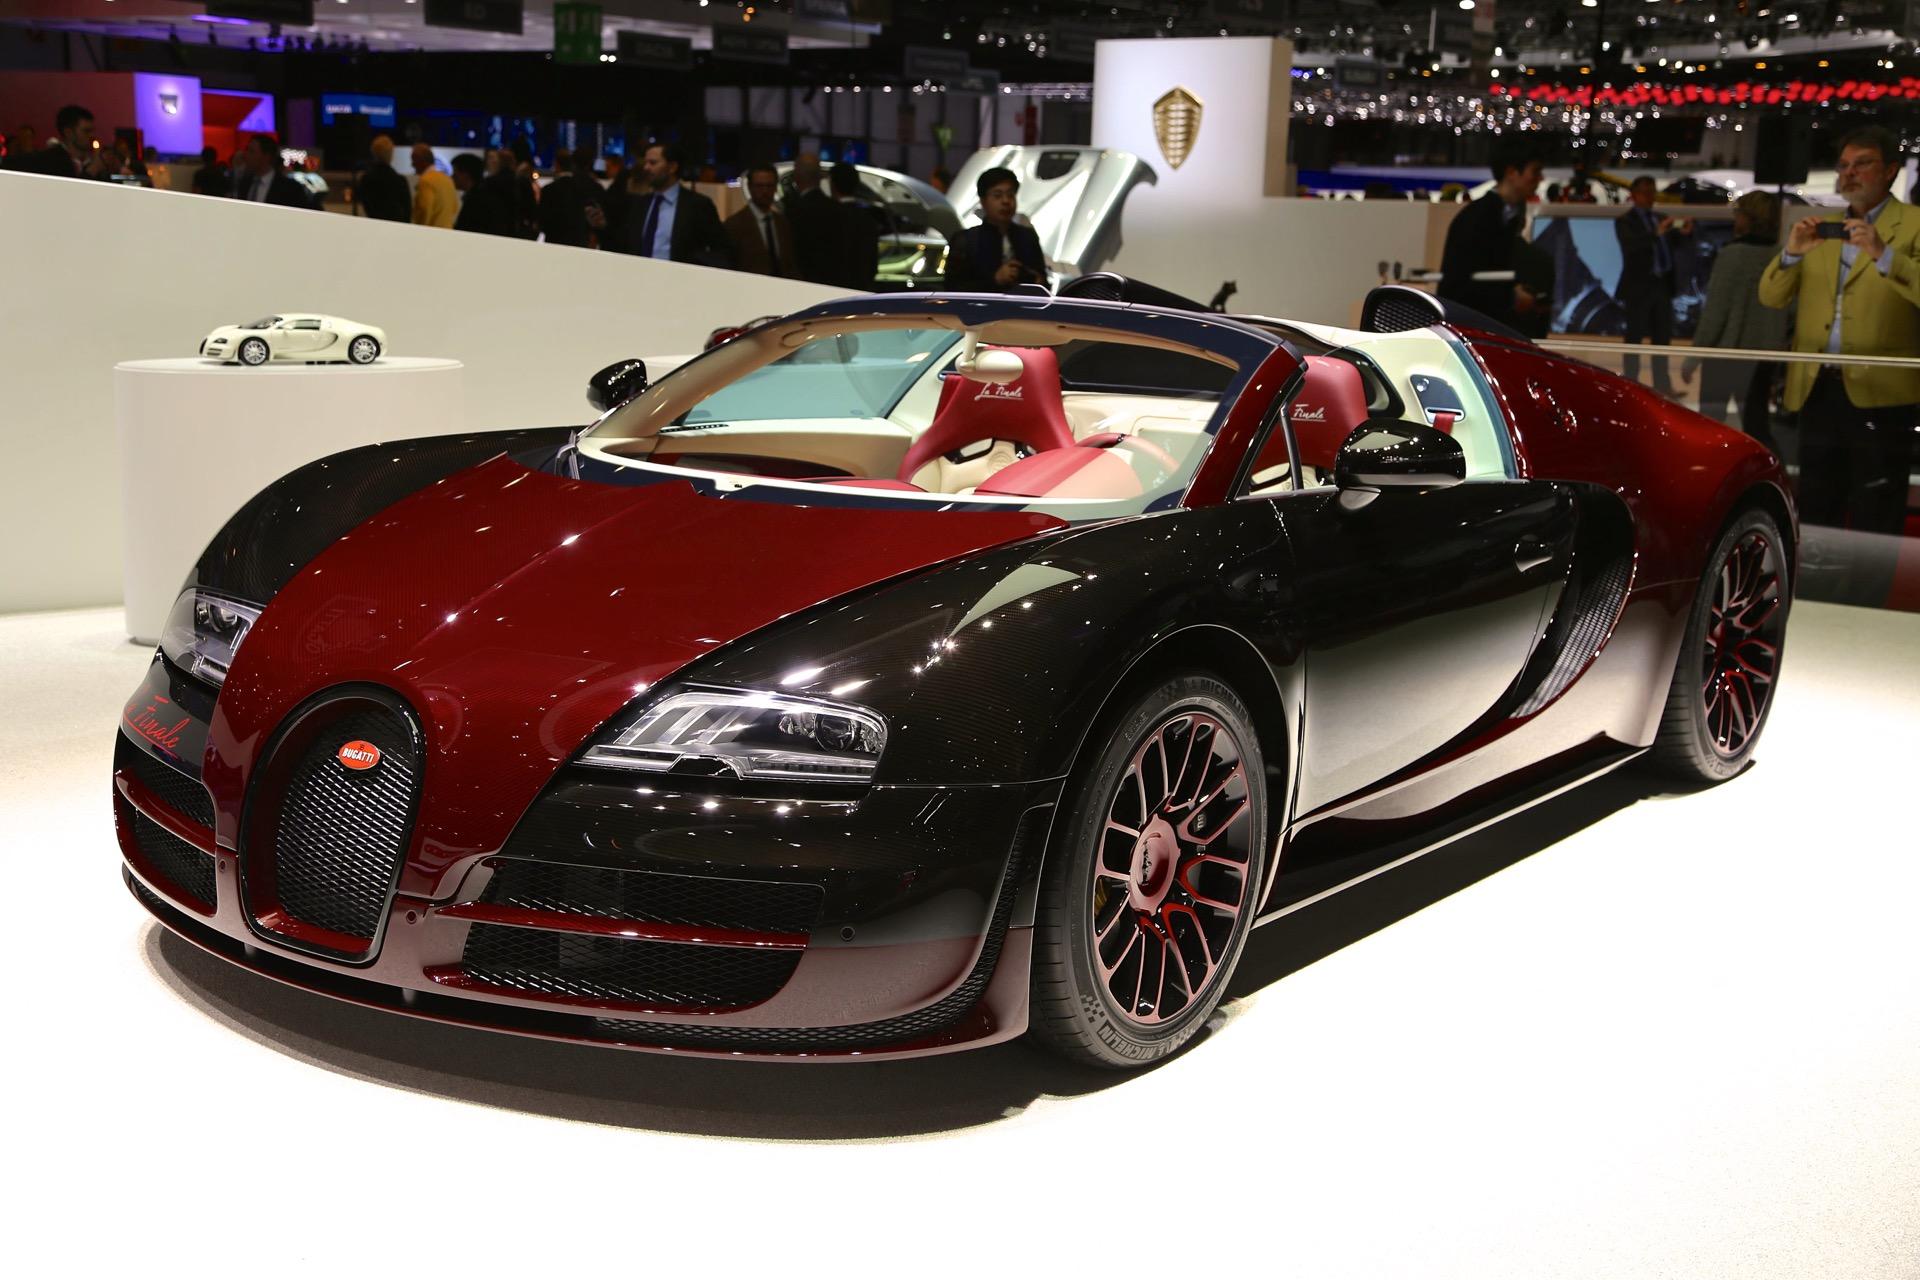 bugatti veyron grand sport vitesse la finale revealed live photos and video. Black Bedroom Furniture Sets. Home Design Ideas